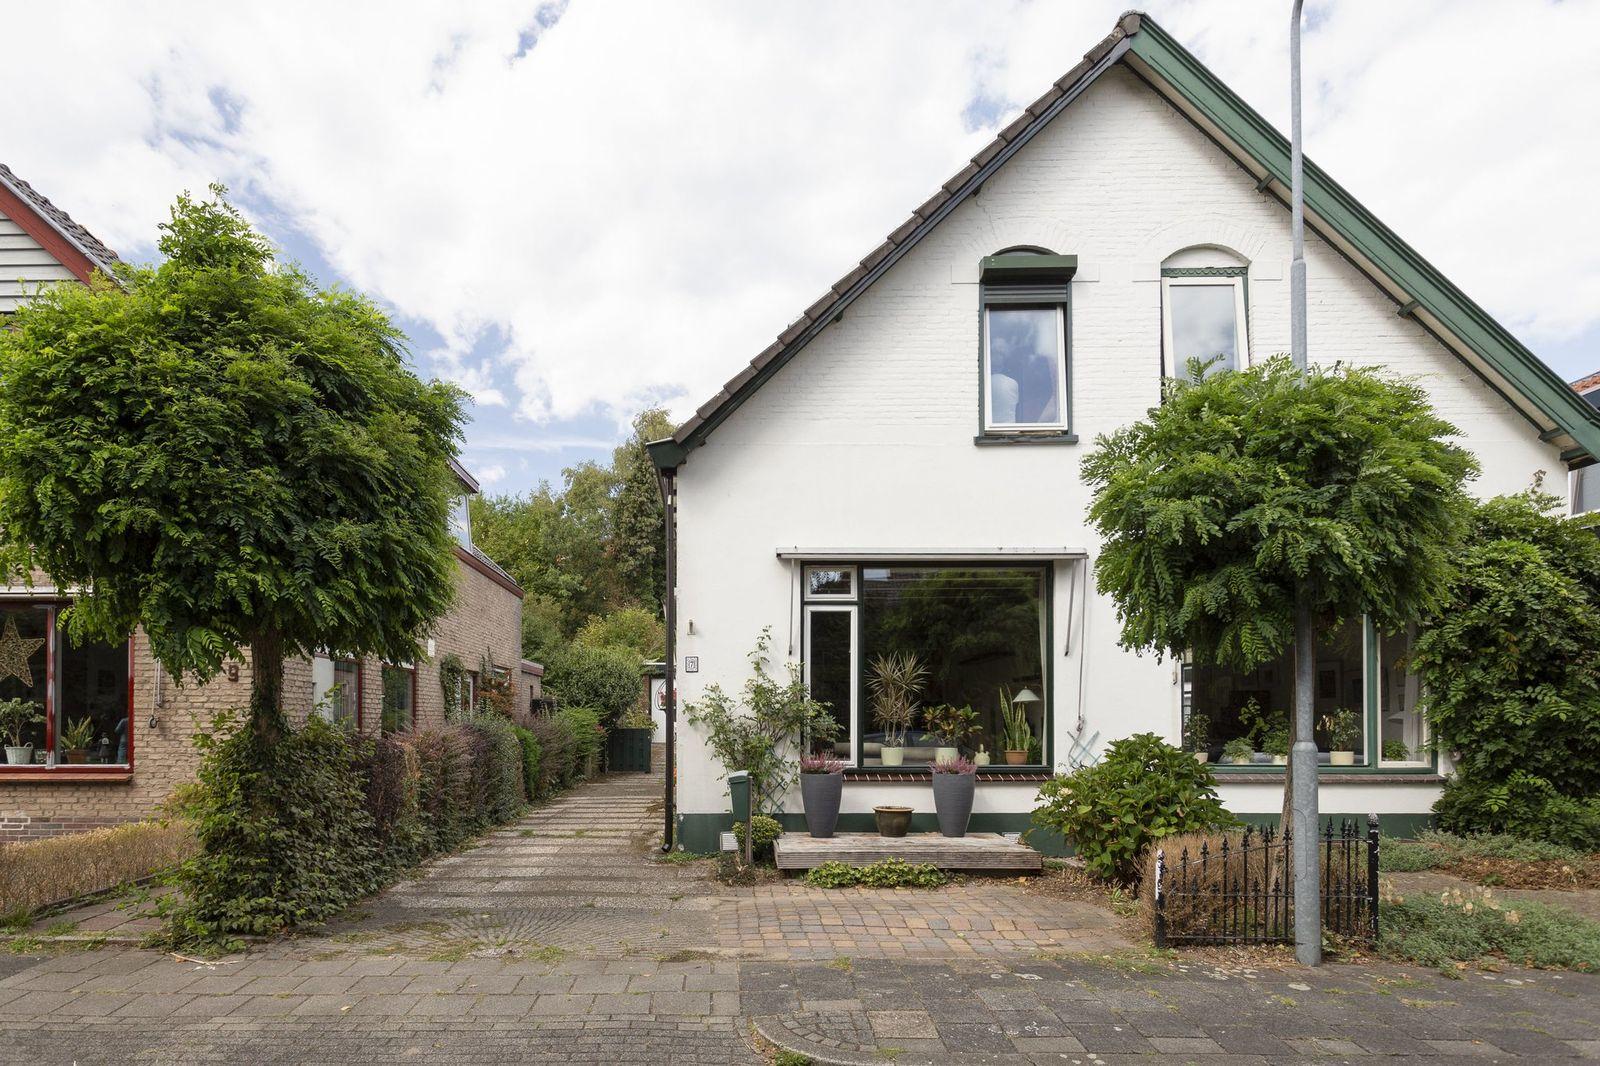 Stortweg 7, Oosterbeek